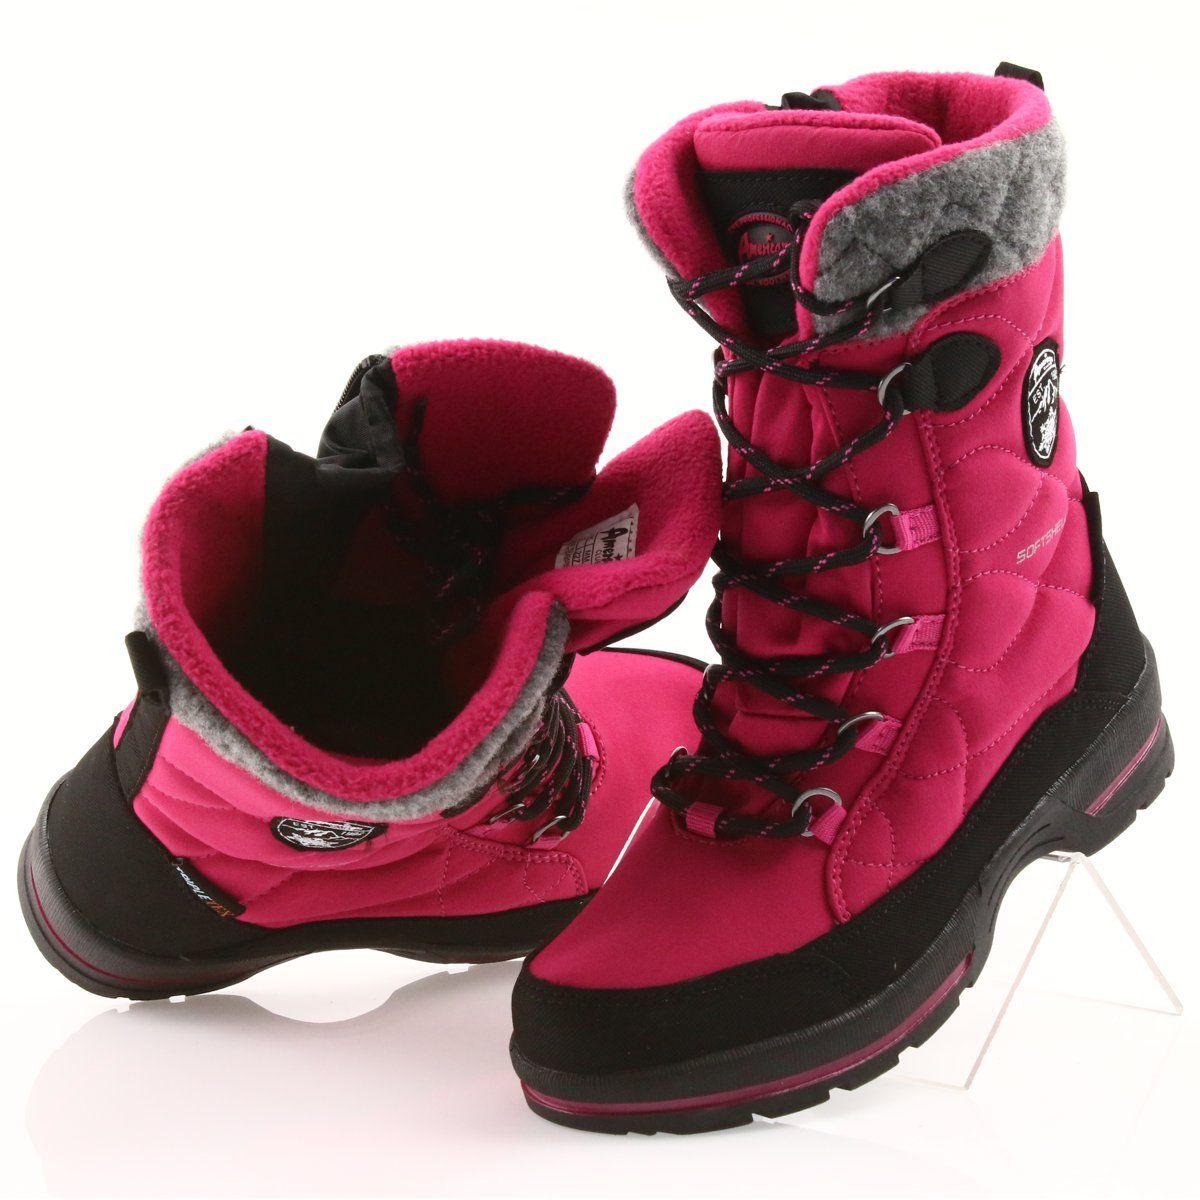 American Club Sniegowce Z Membrana American 801sb Rozowe Czarne Szare Boots Shoes Winter Boot